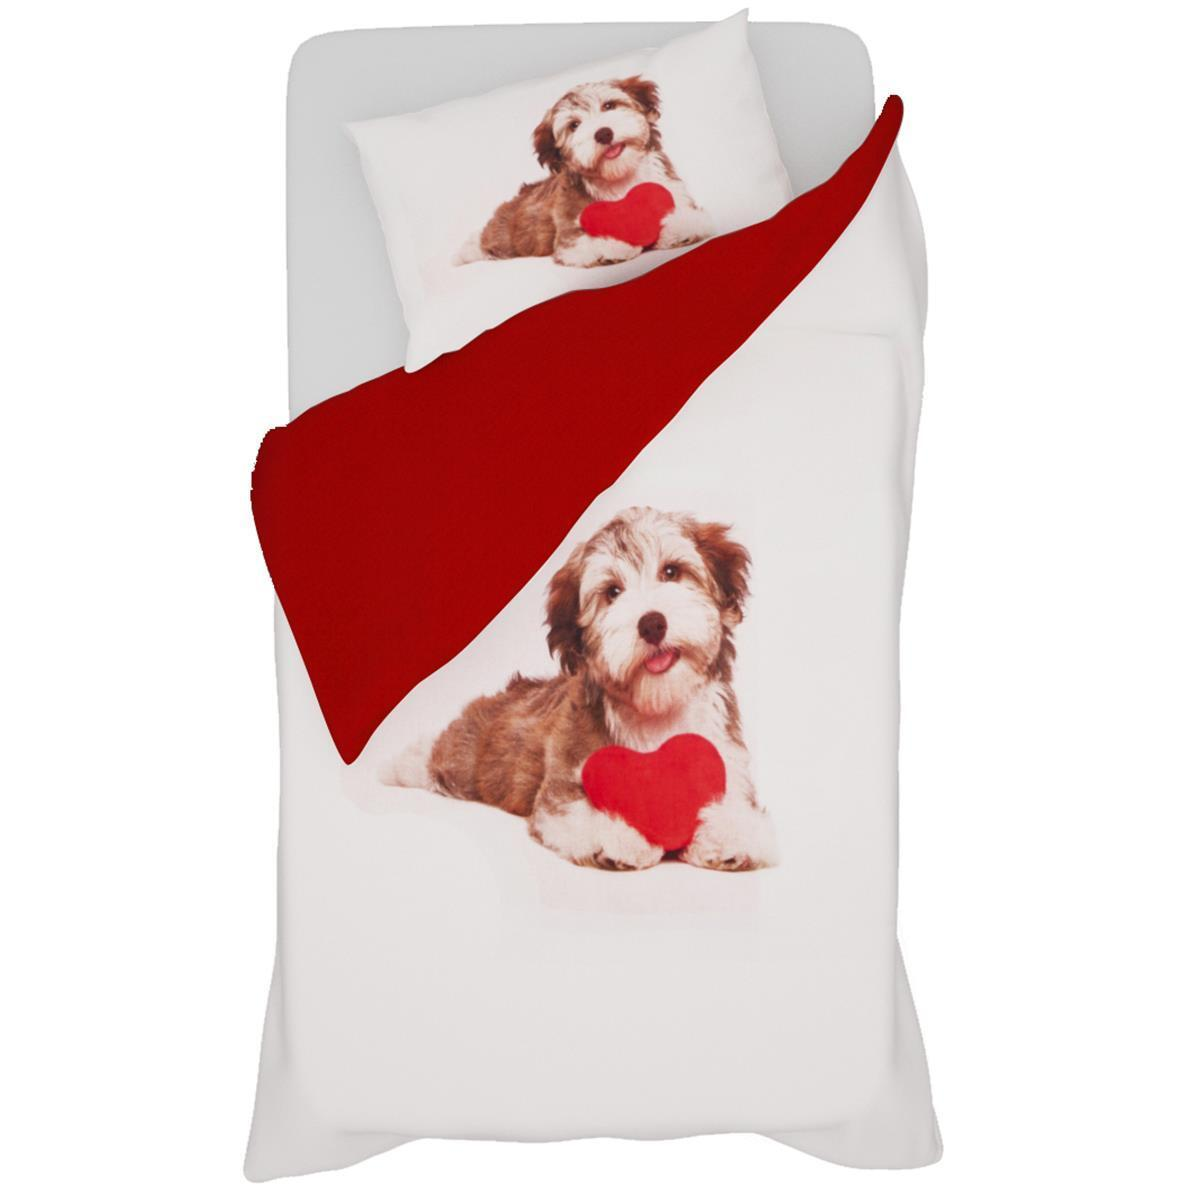 Copripiumino Copripiumino Copripiumino Parure con stampa digitale Dog in Love Singolo una piazza N416 7fd8fe